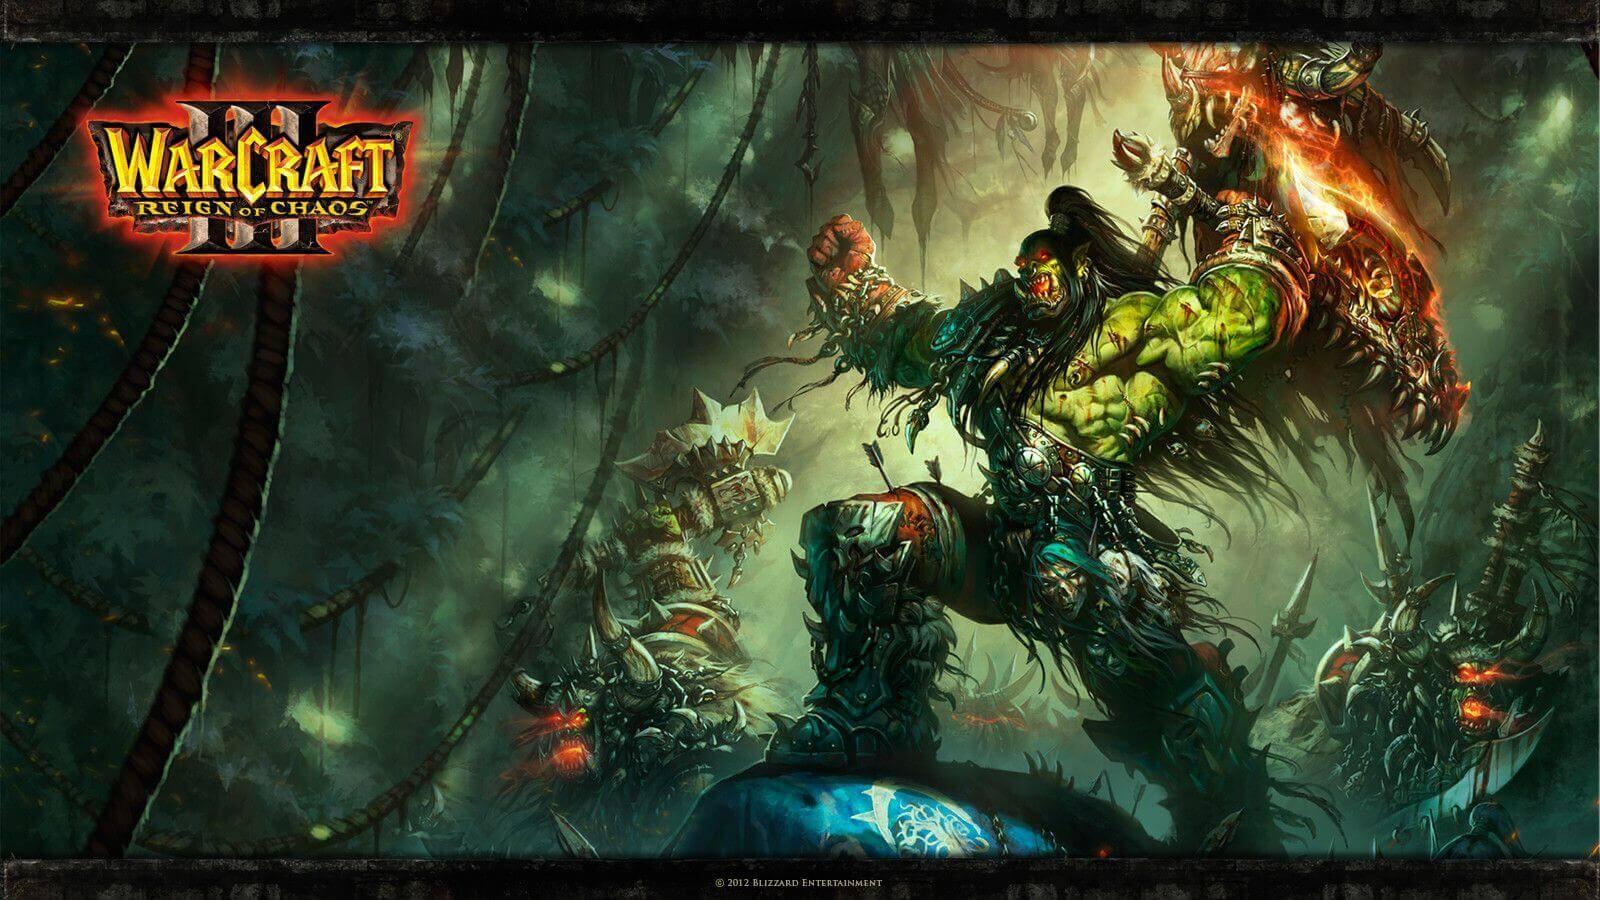 Lançamento do driver AMD Radeon Adrenalin 2020 Edition 20.1.4, otimizado para Warcraft ...